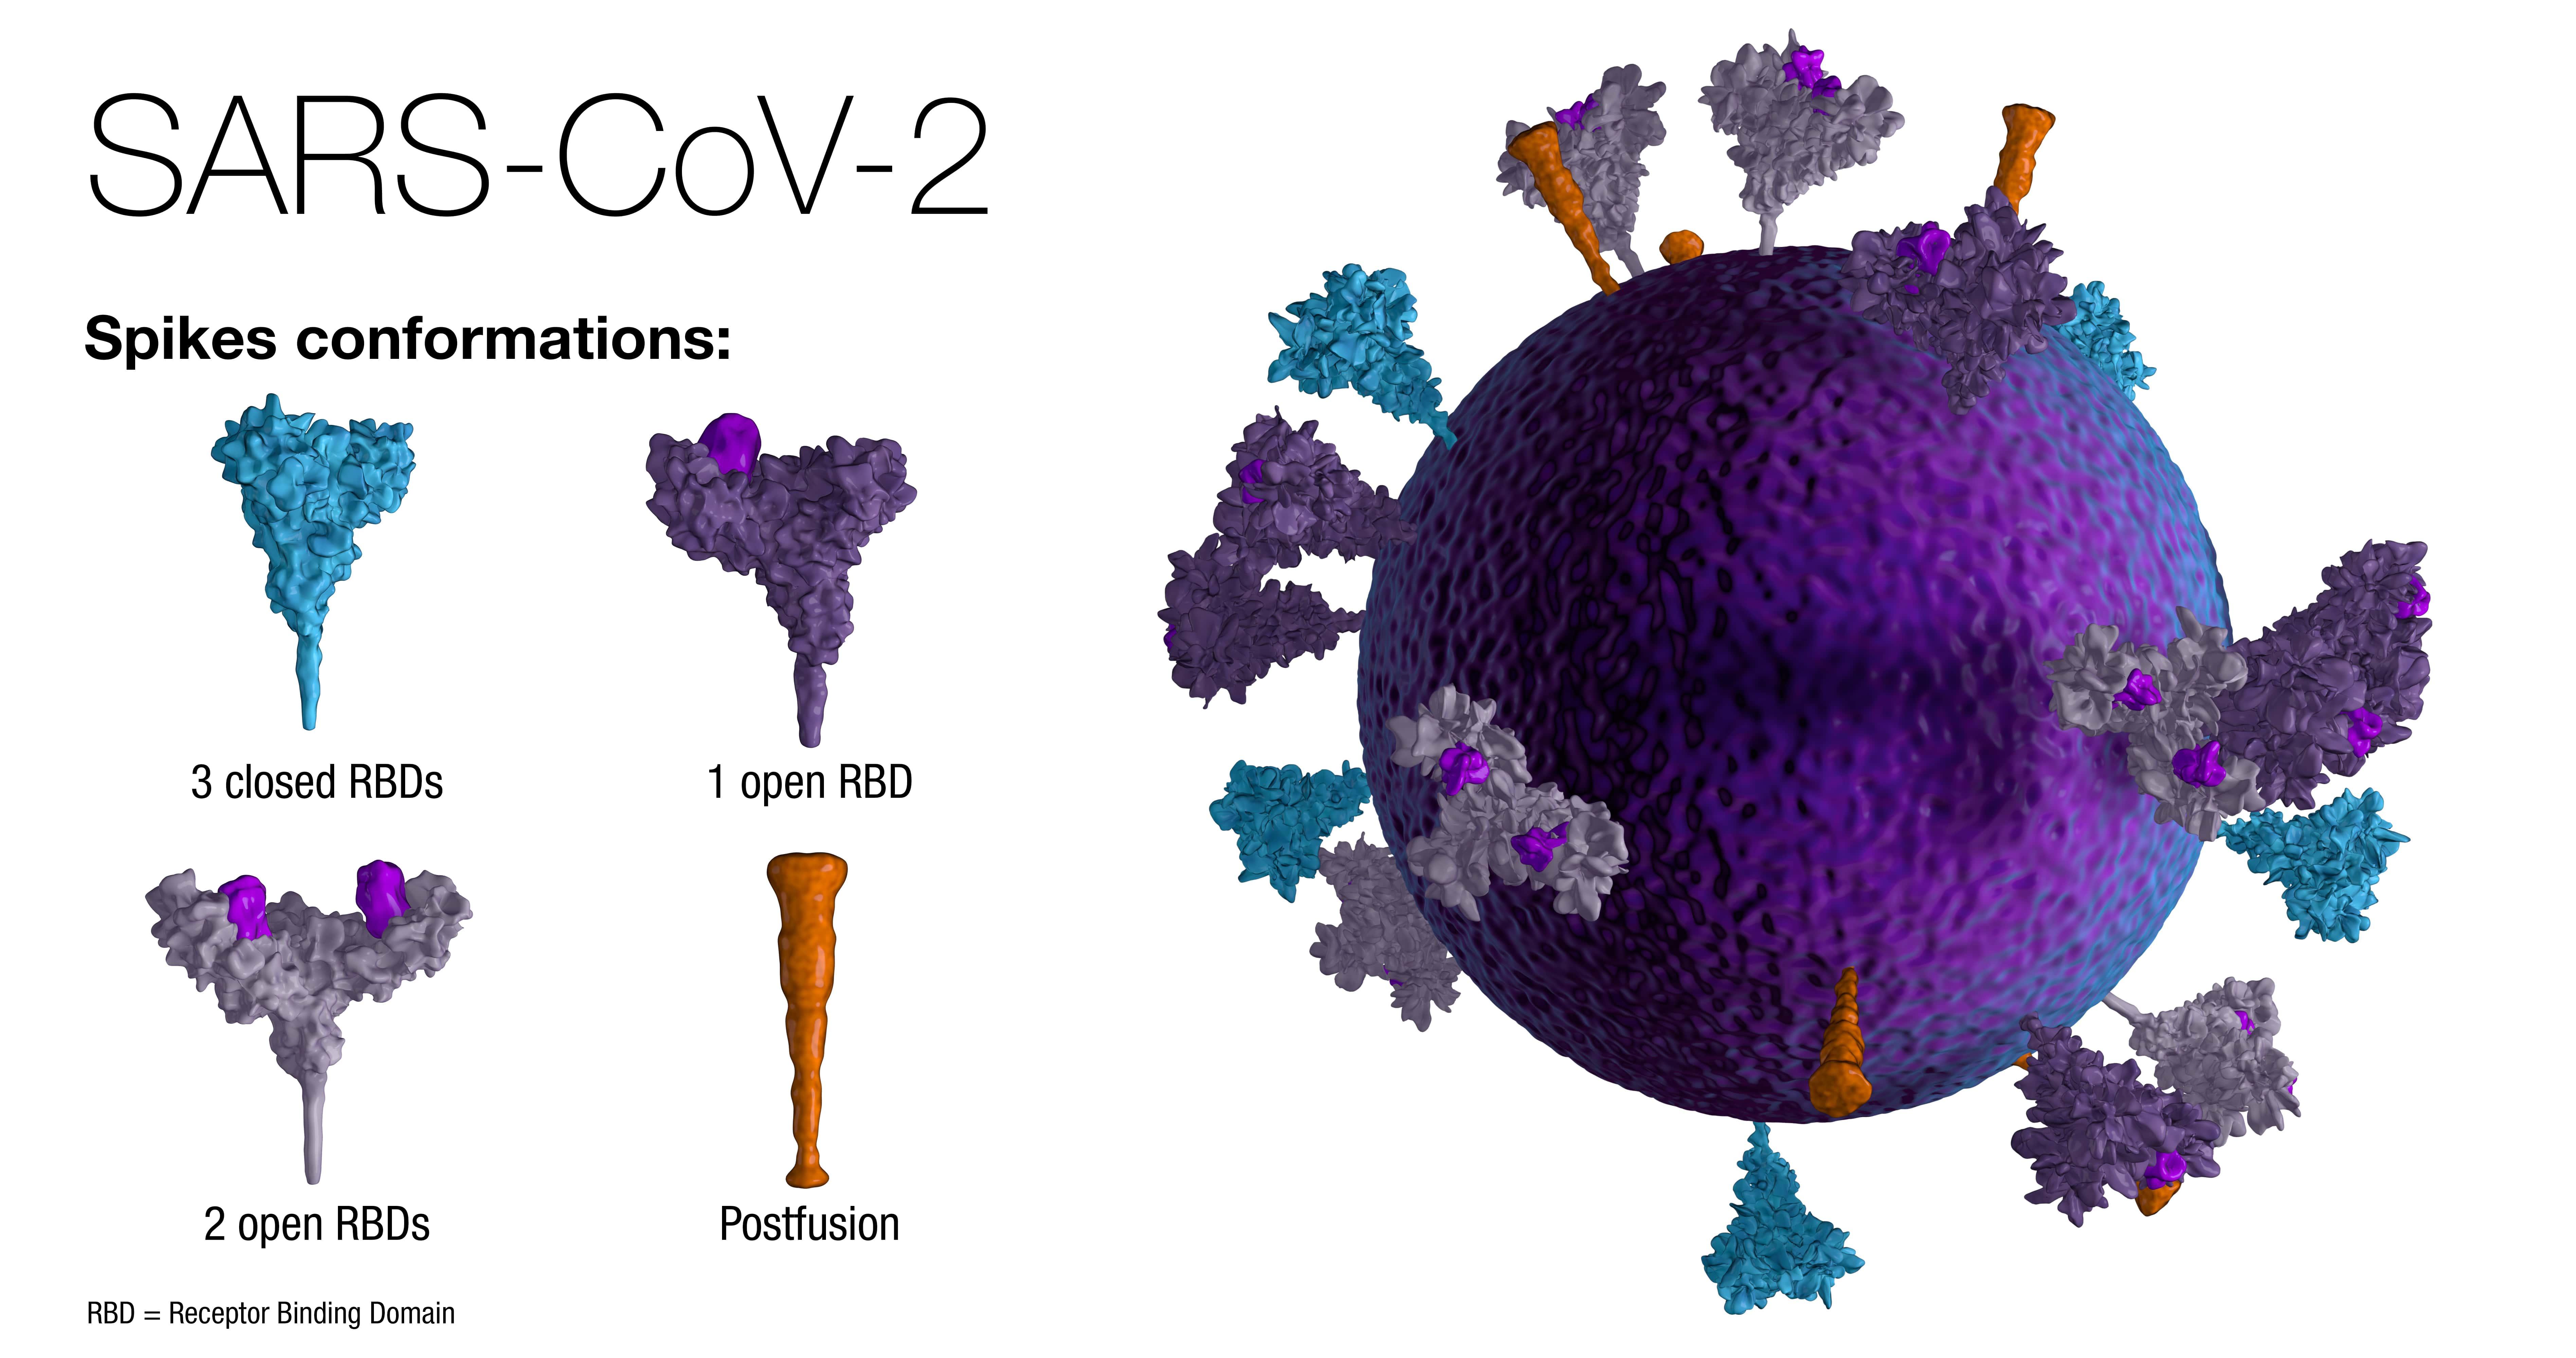 SARS-CoV-2 Diagram